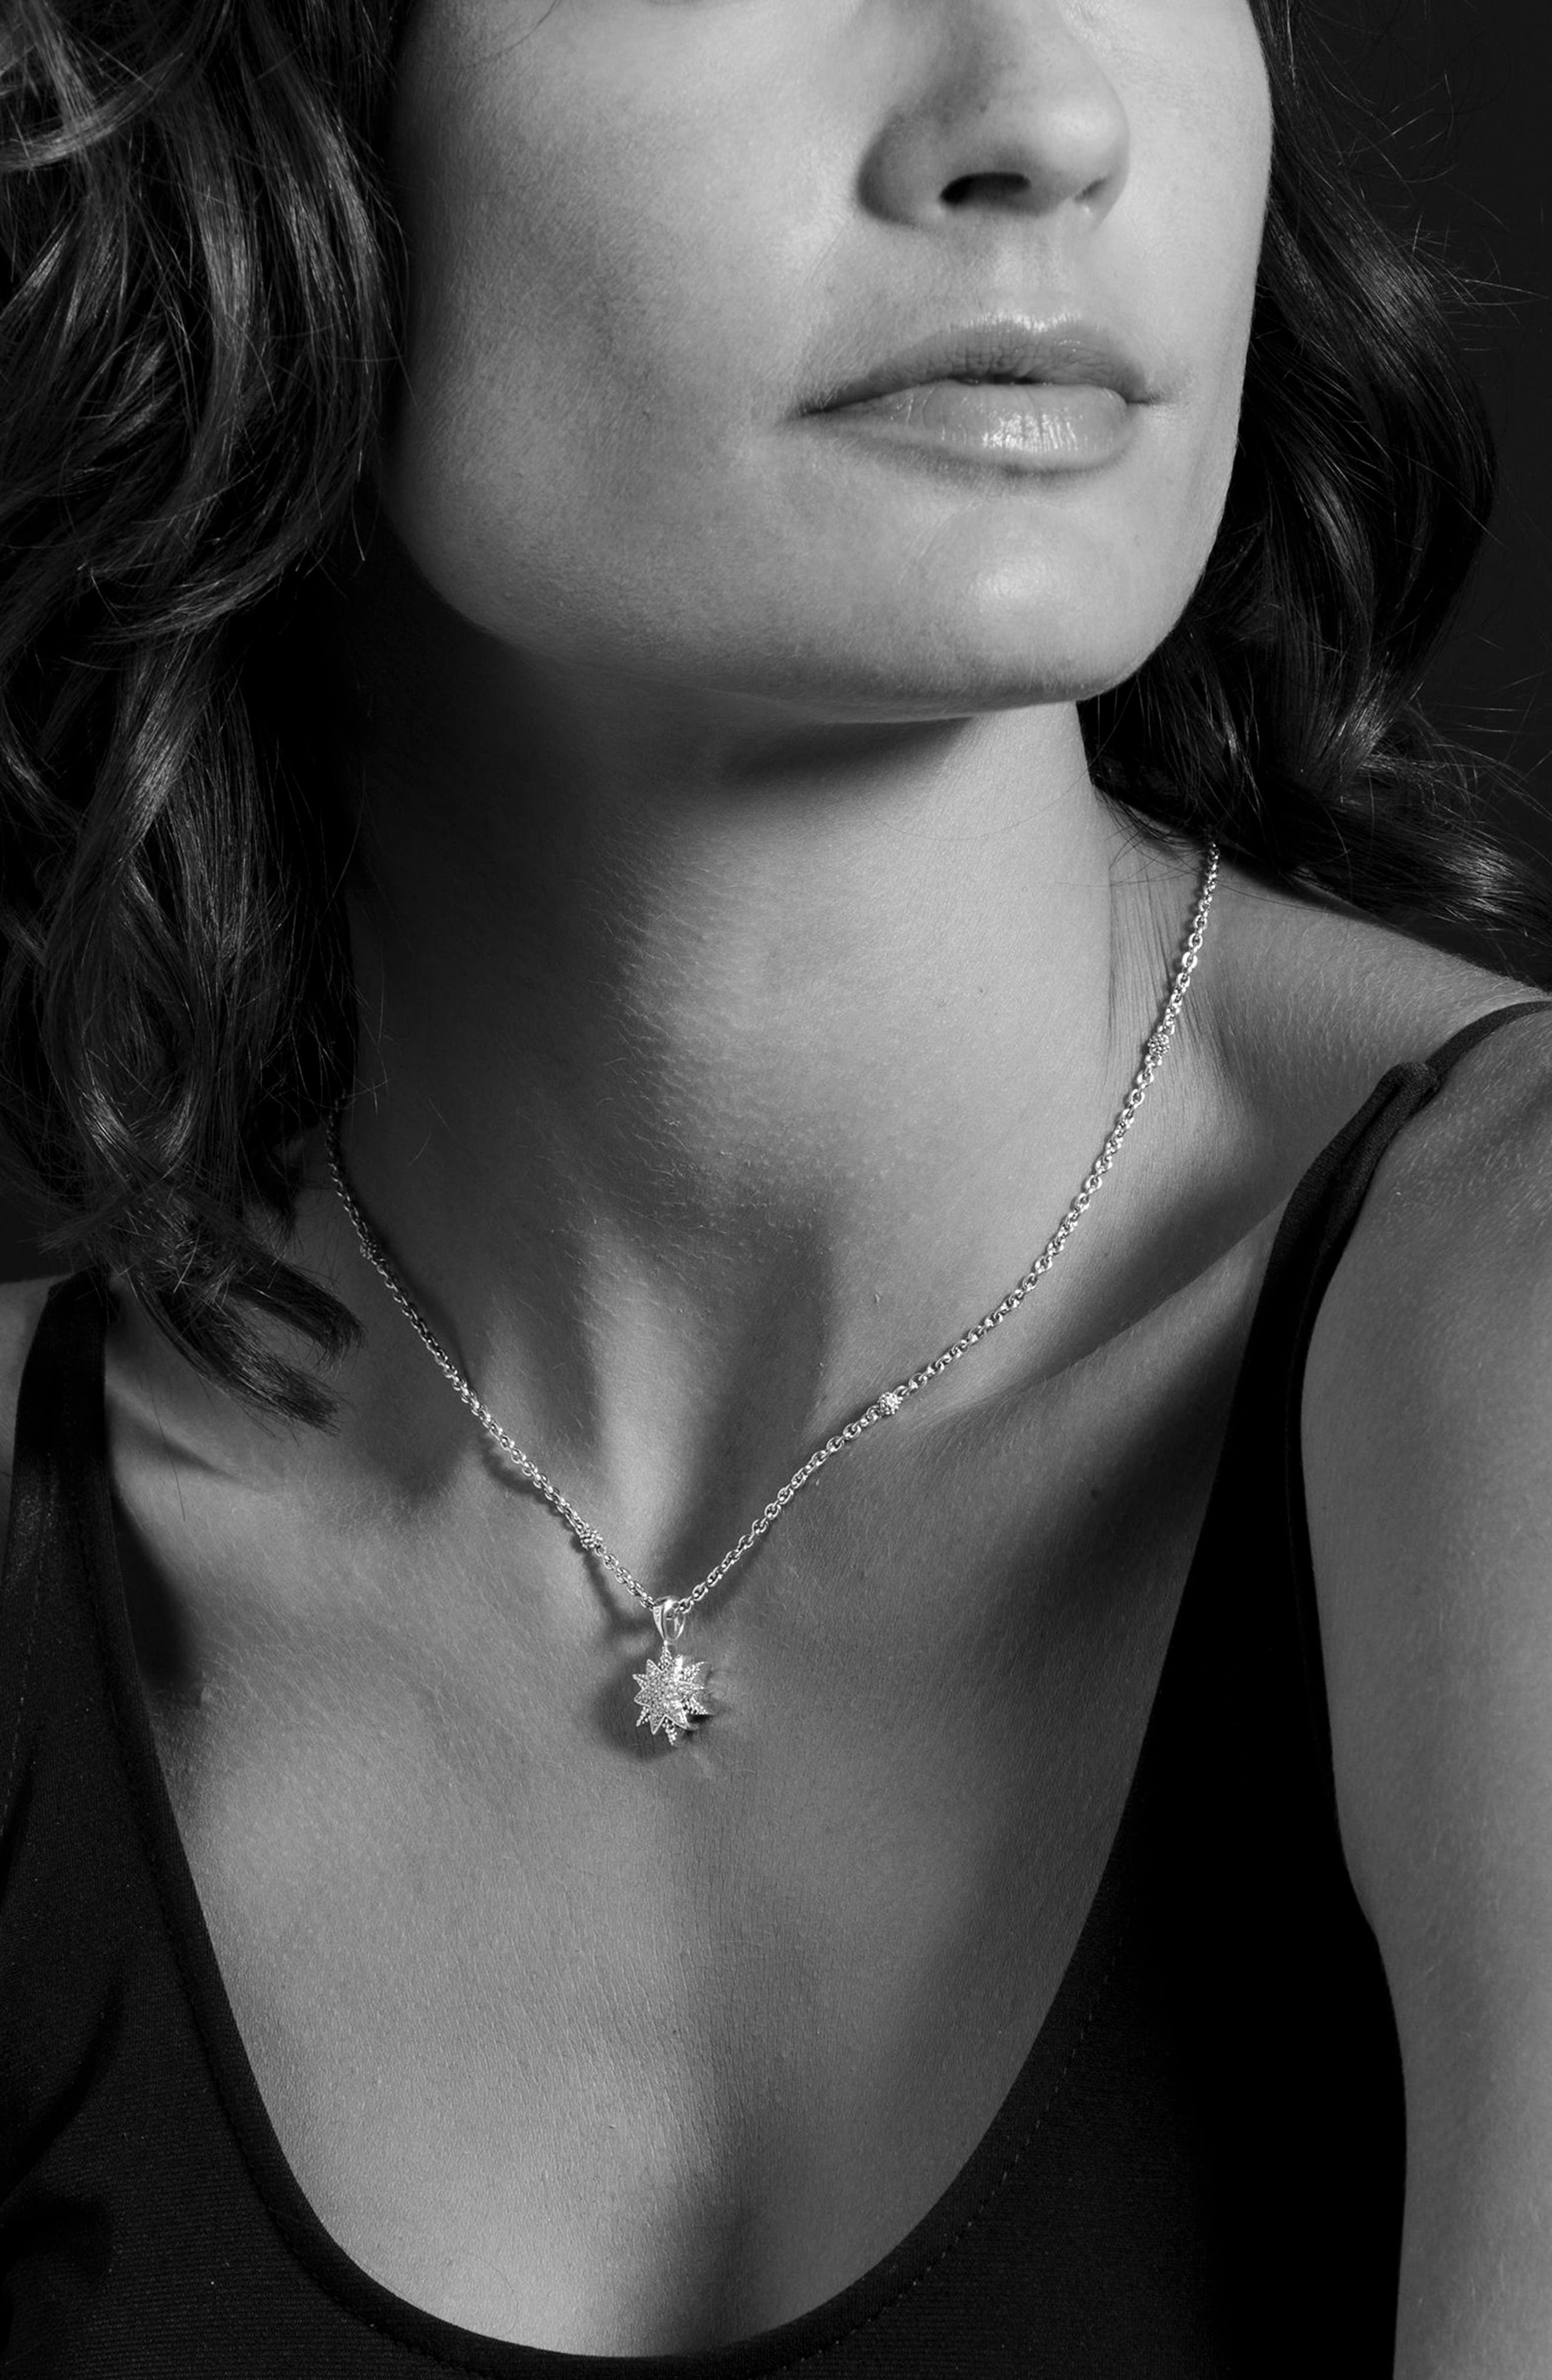 North Star Small Diamond Pendant Necklace,                             Alternate thumbnail 2, color,                             Diamond